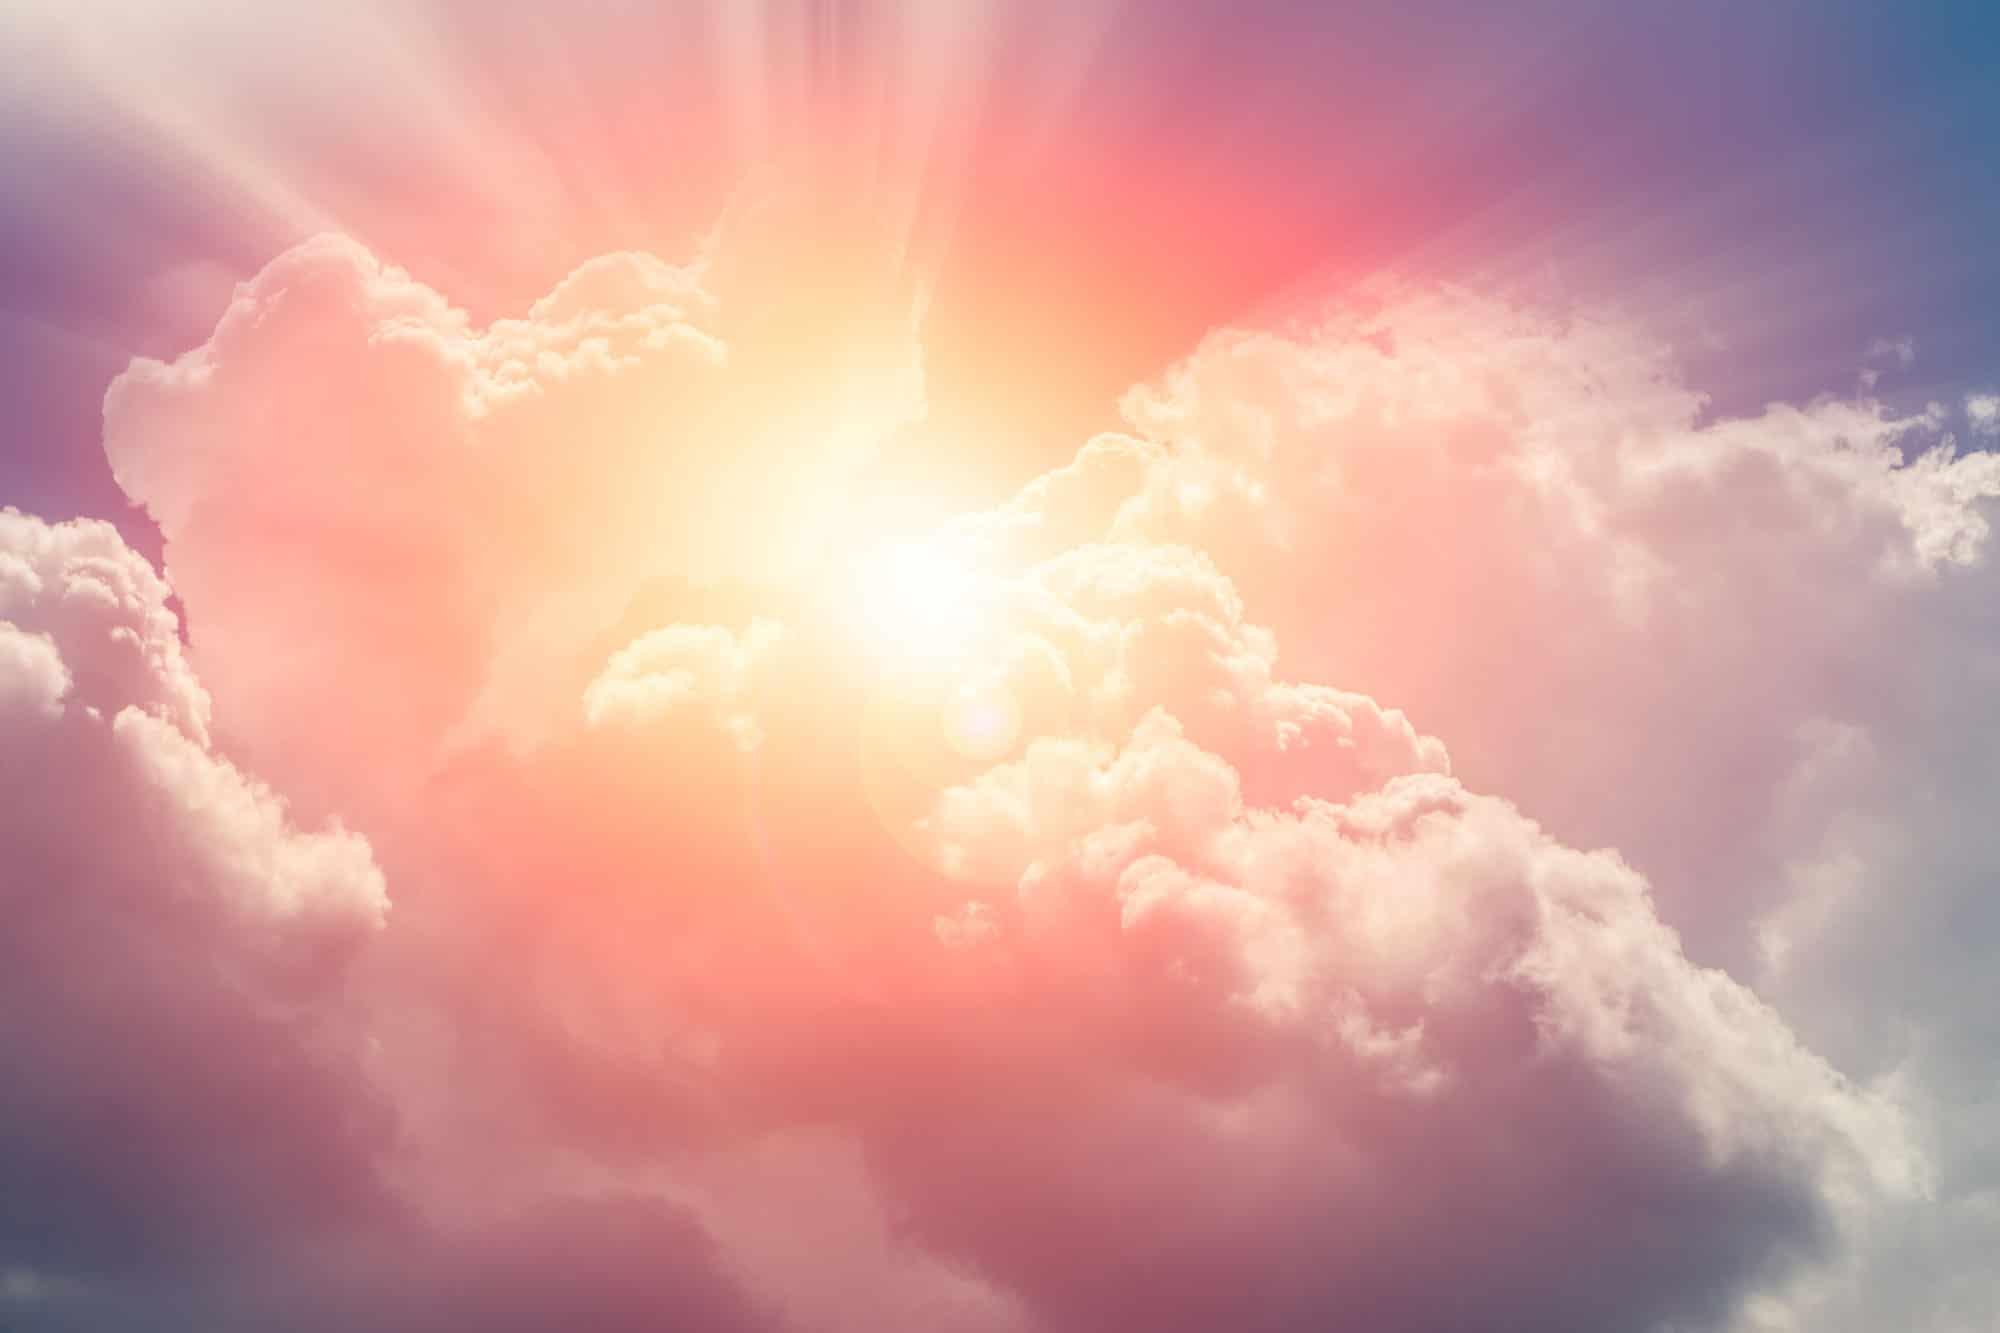 spiritual enlightenment - How to Achieve Spiritual Enlightenment